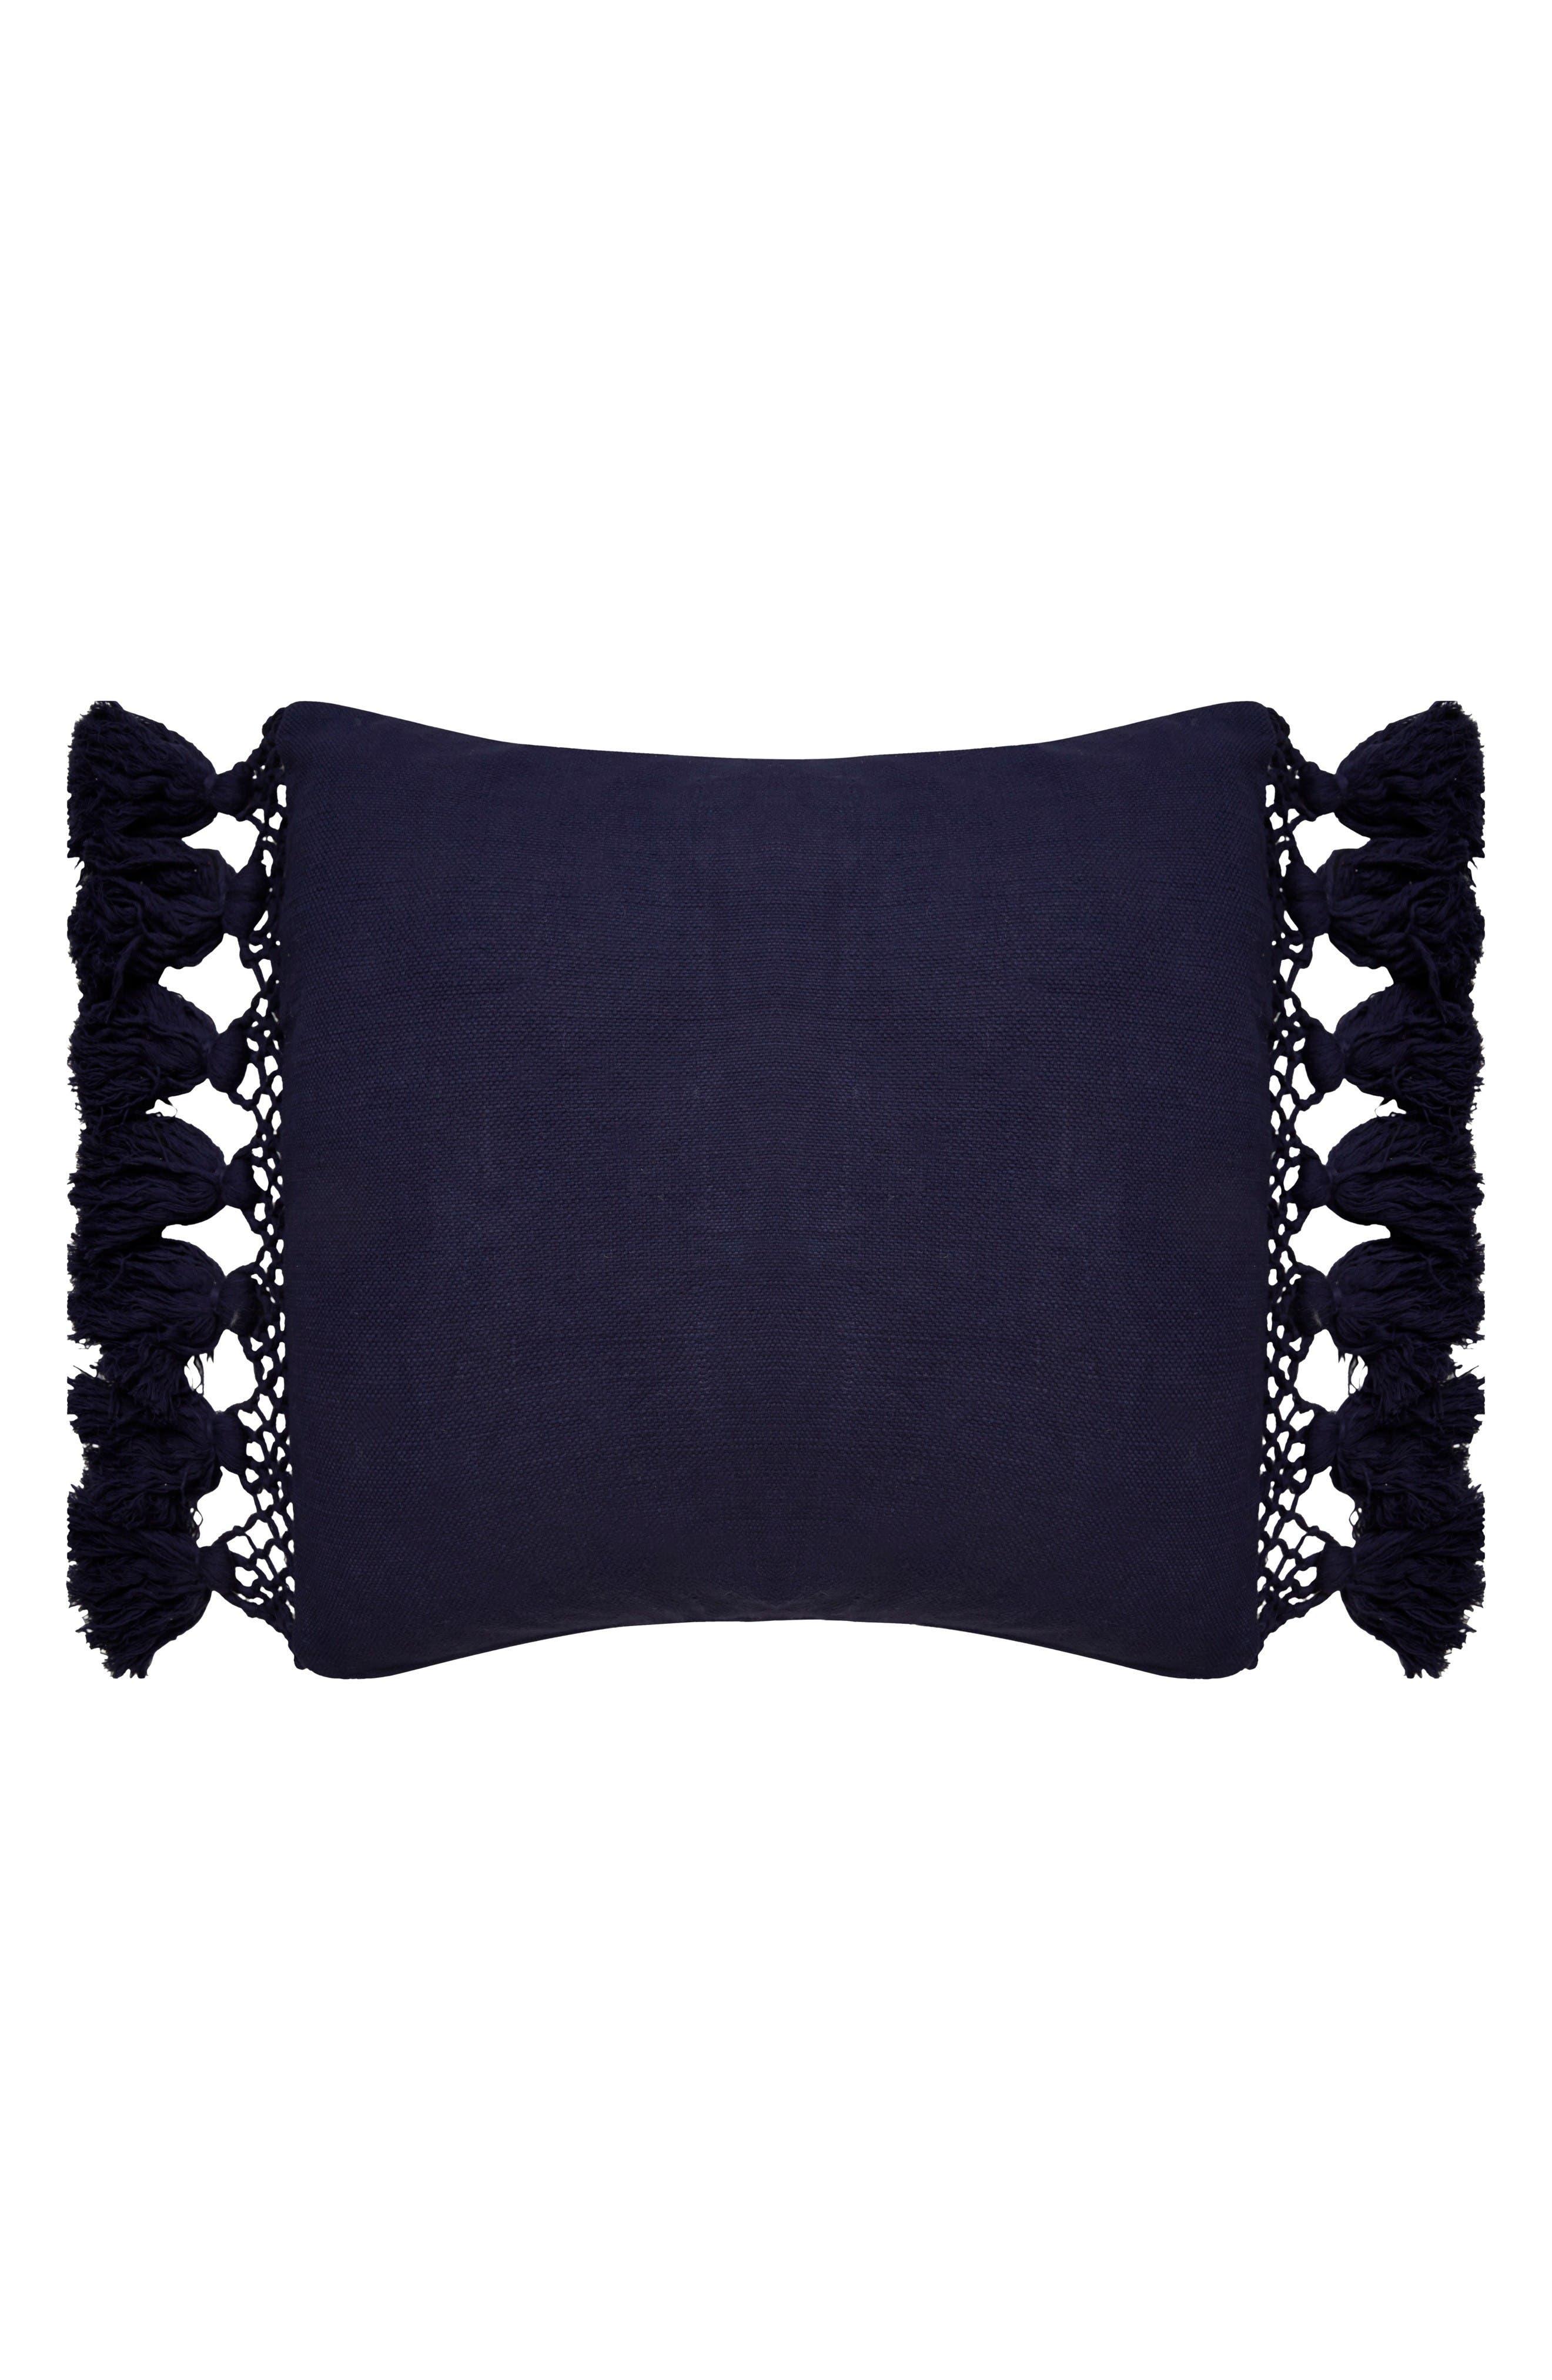 Main Image - kate spade new york tassel accent pillow